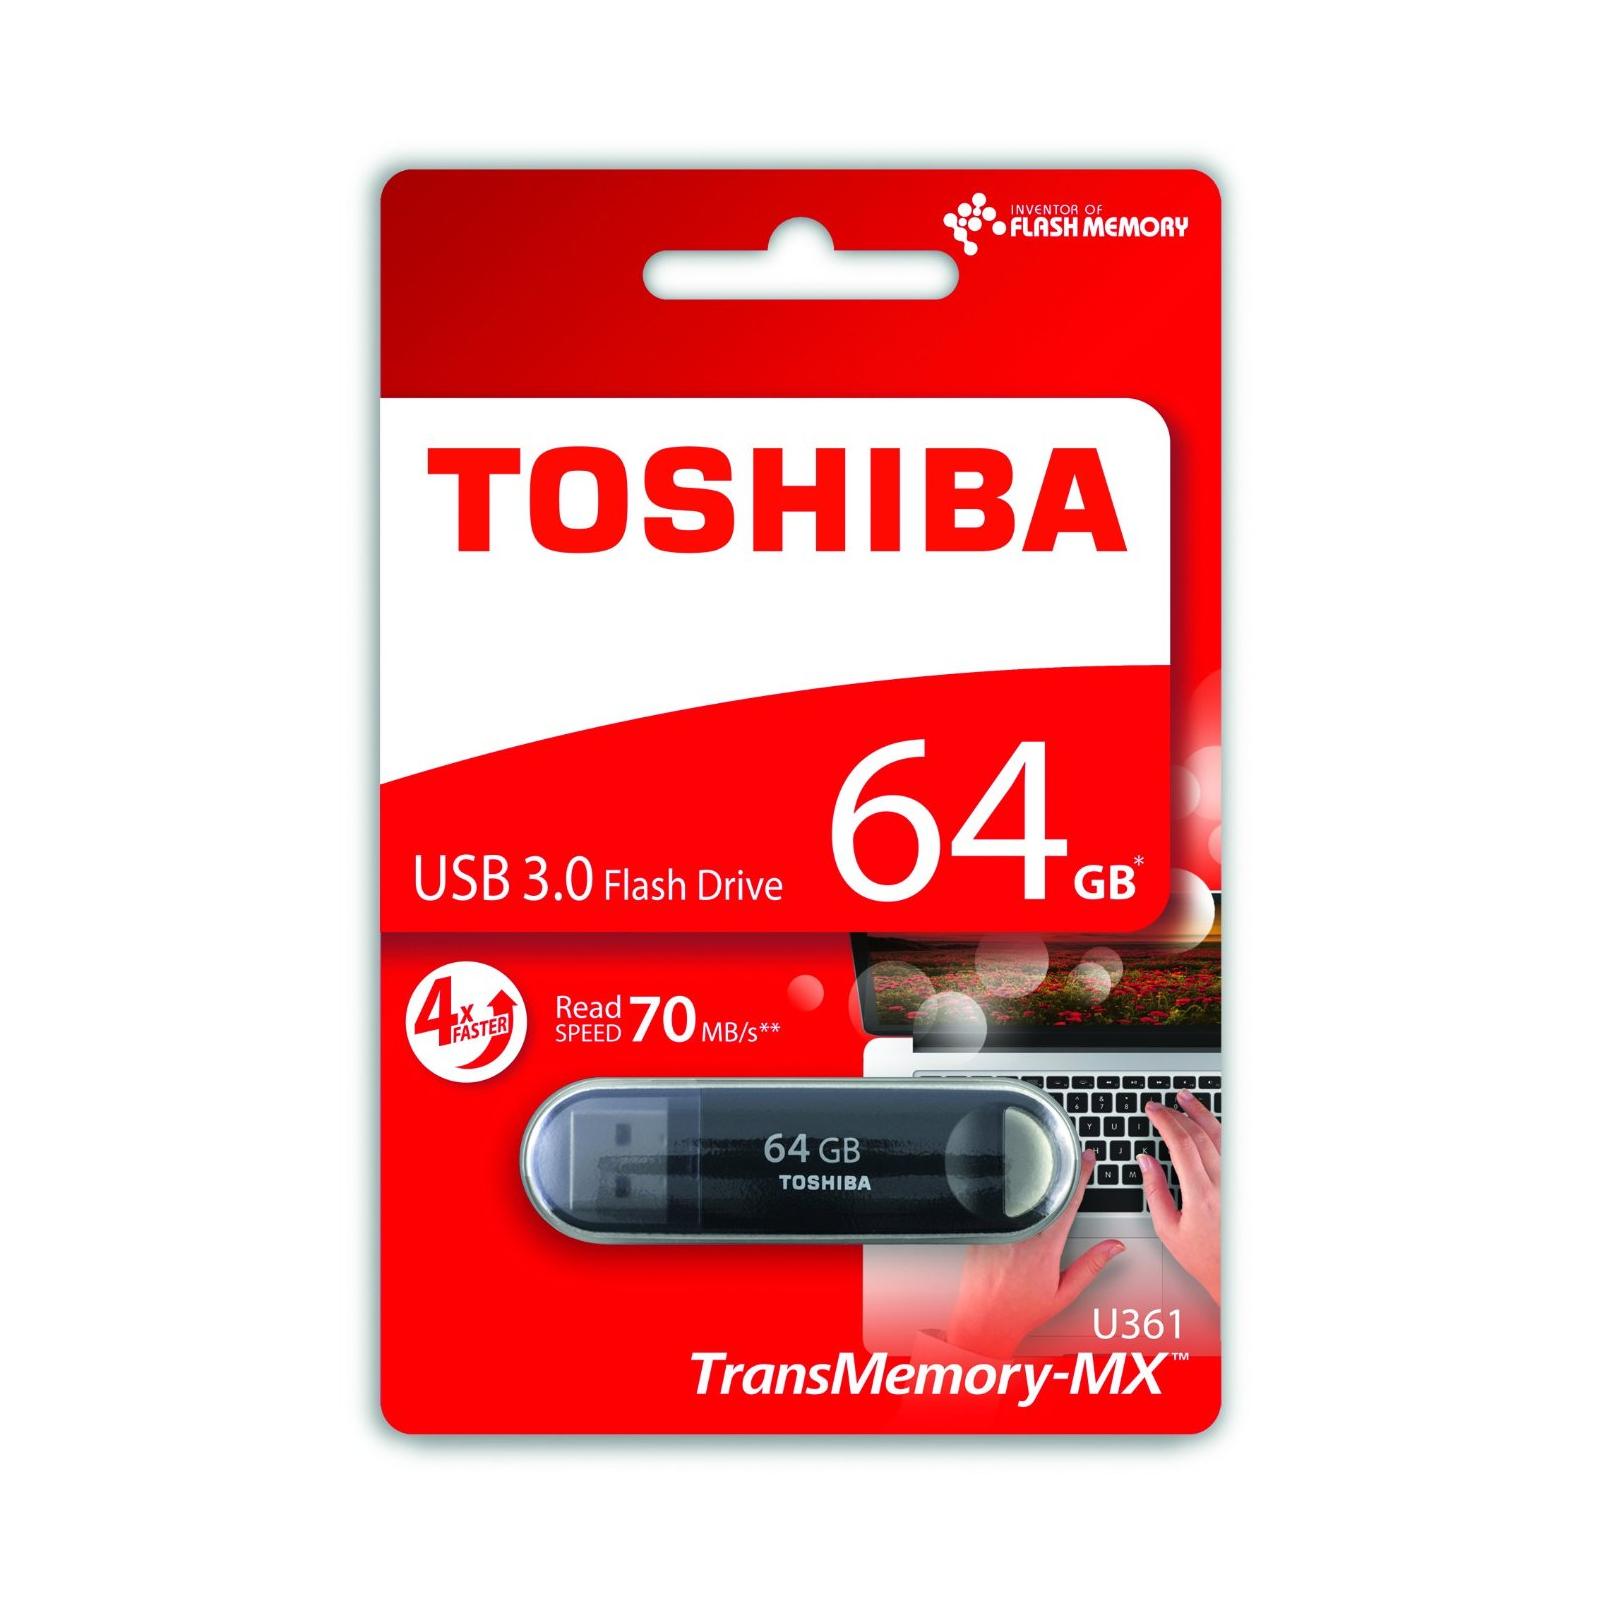 USB флеш накопитель TOSHIBA 64GB Suzaku Black USB 3.0 (THN-U361K0640M4) изображение 3